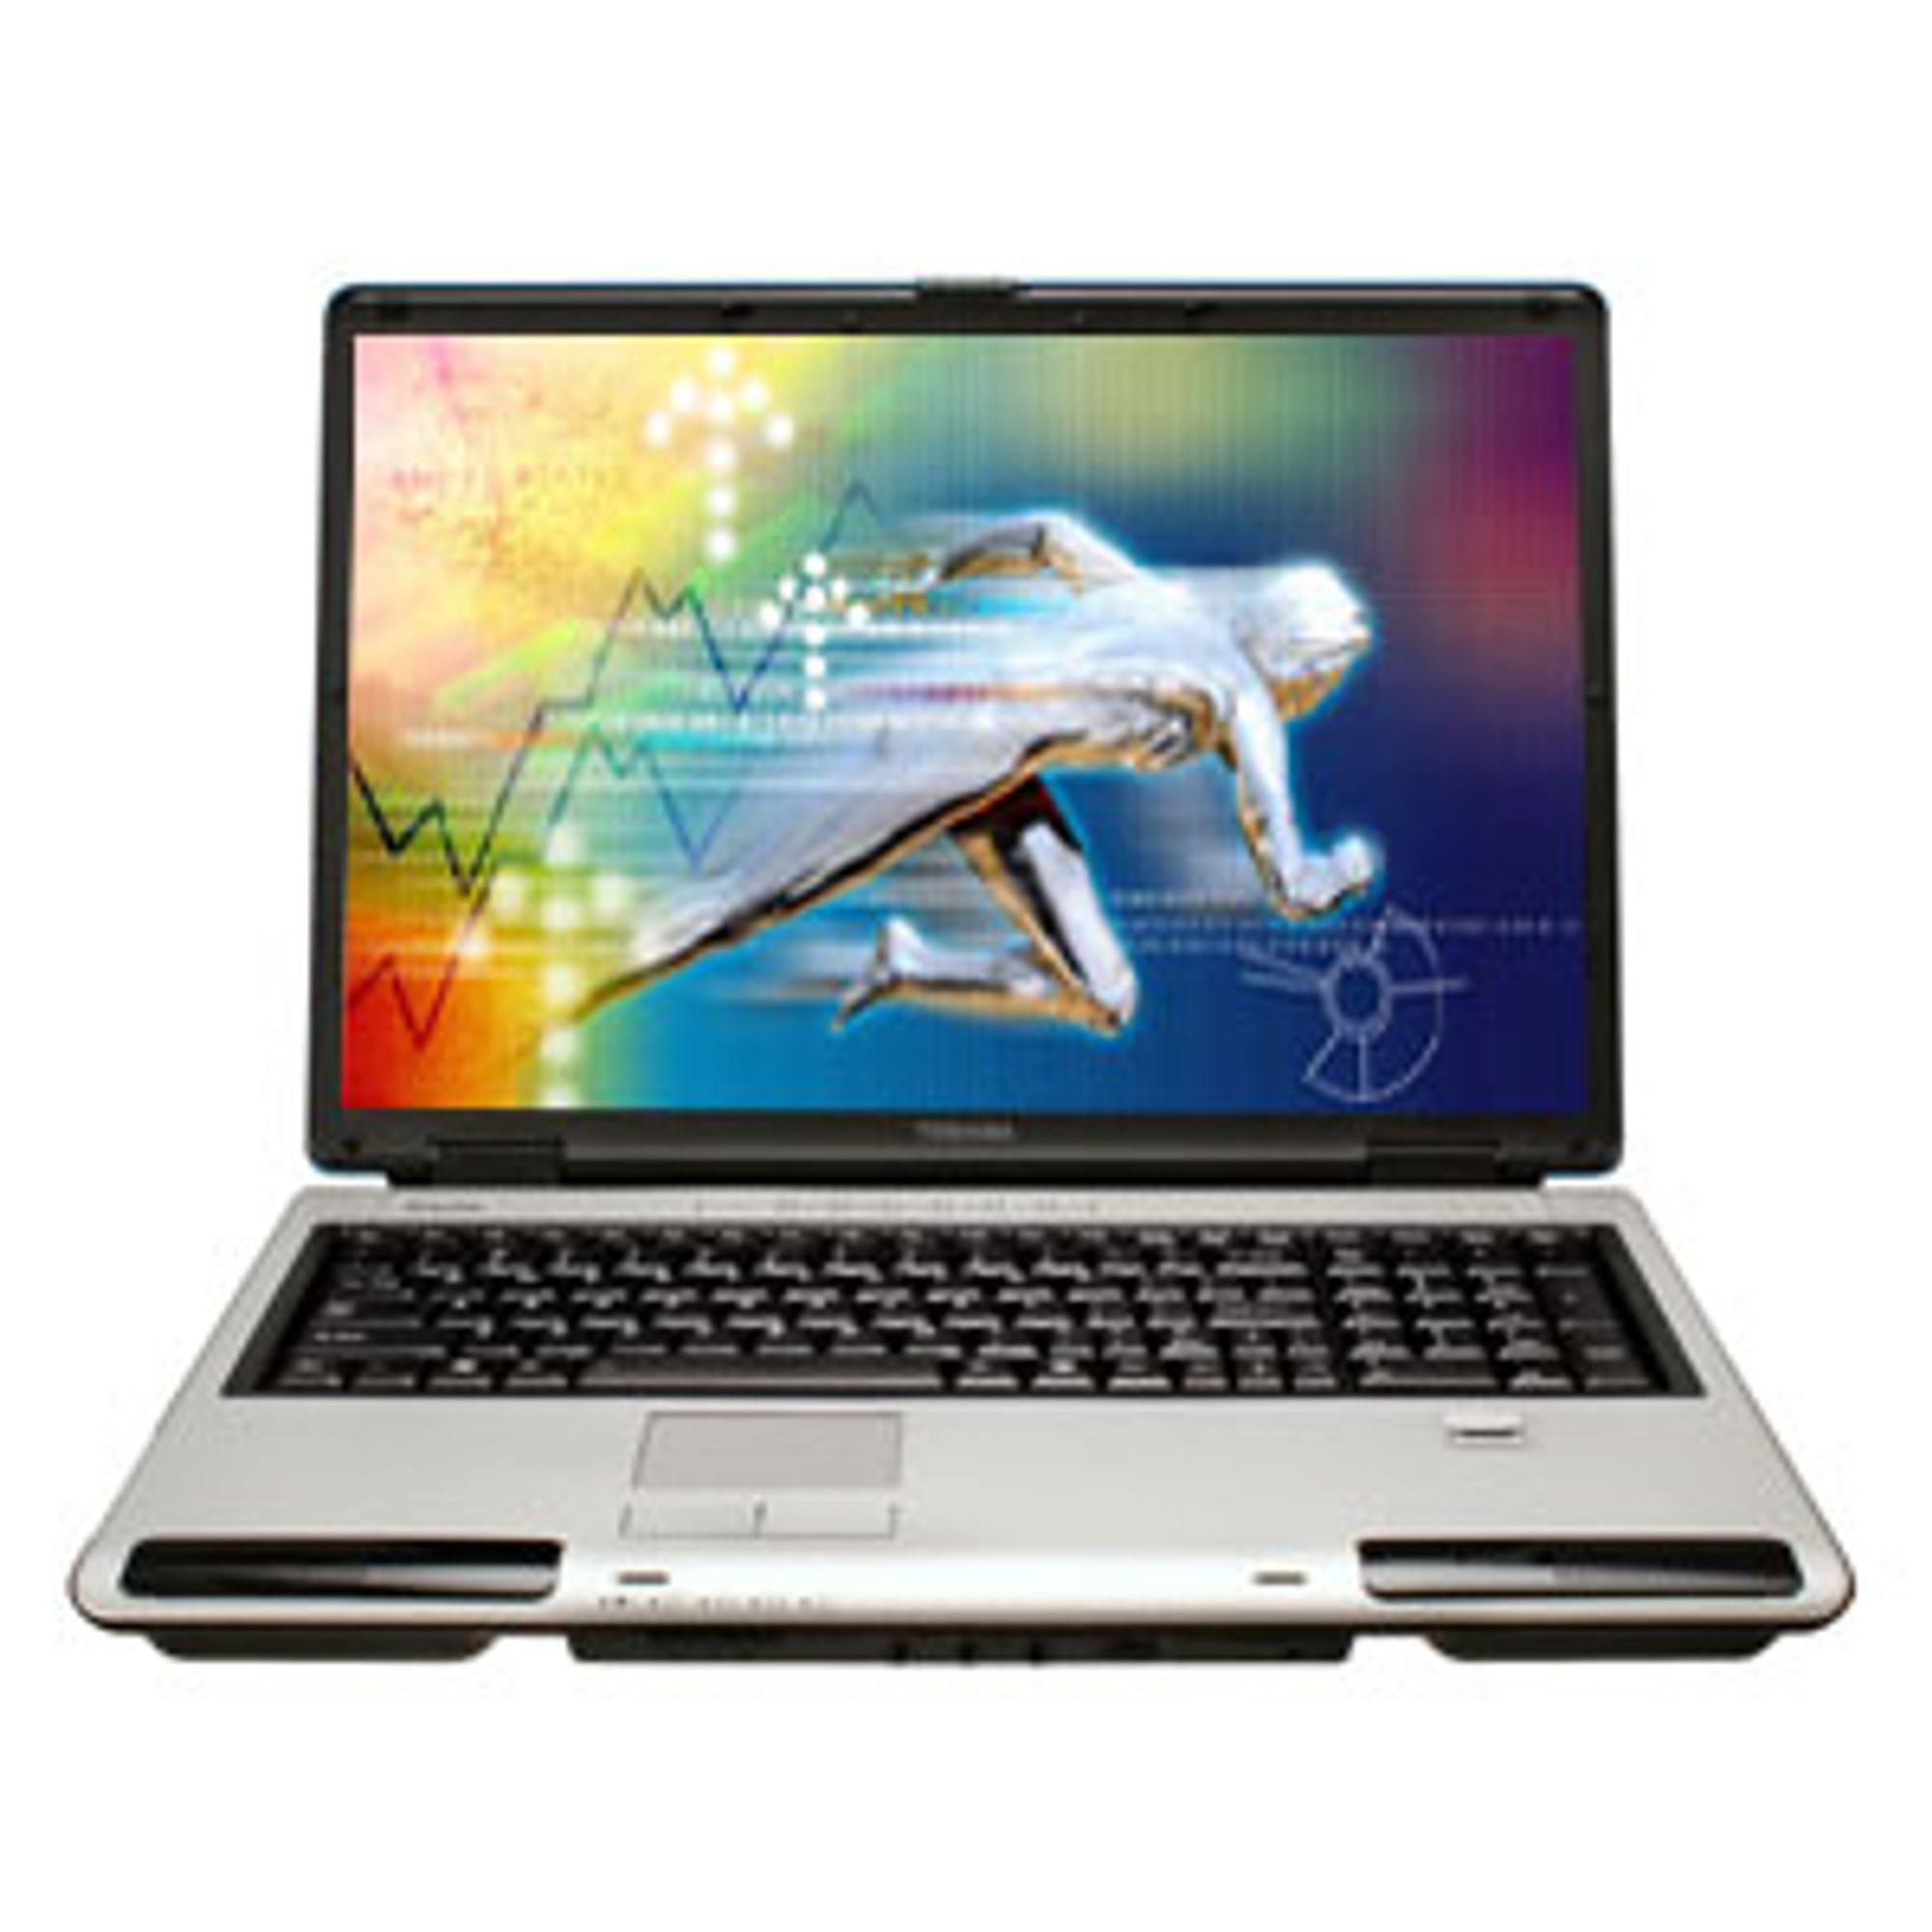 Toshiba-laptop (illustrasjonsfoto)